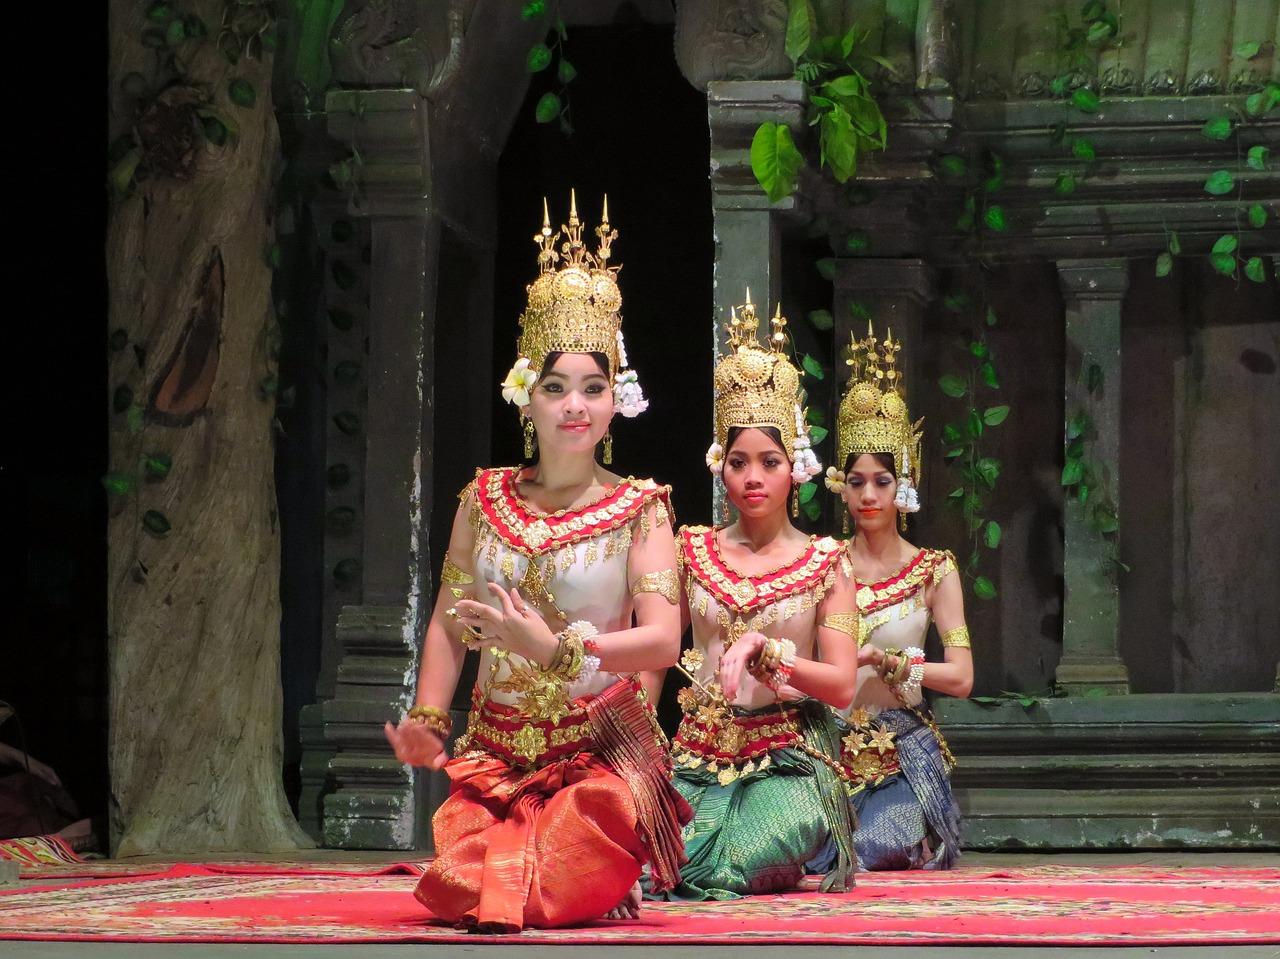 Kombireisen Kambodscha - Kambodscha Reisen Bild 2